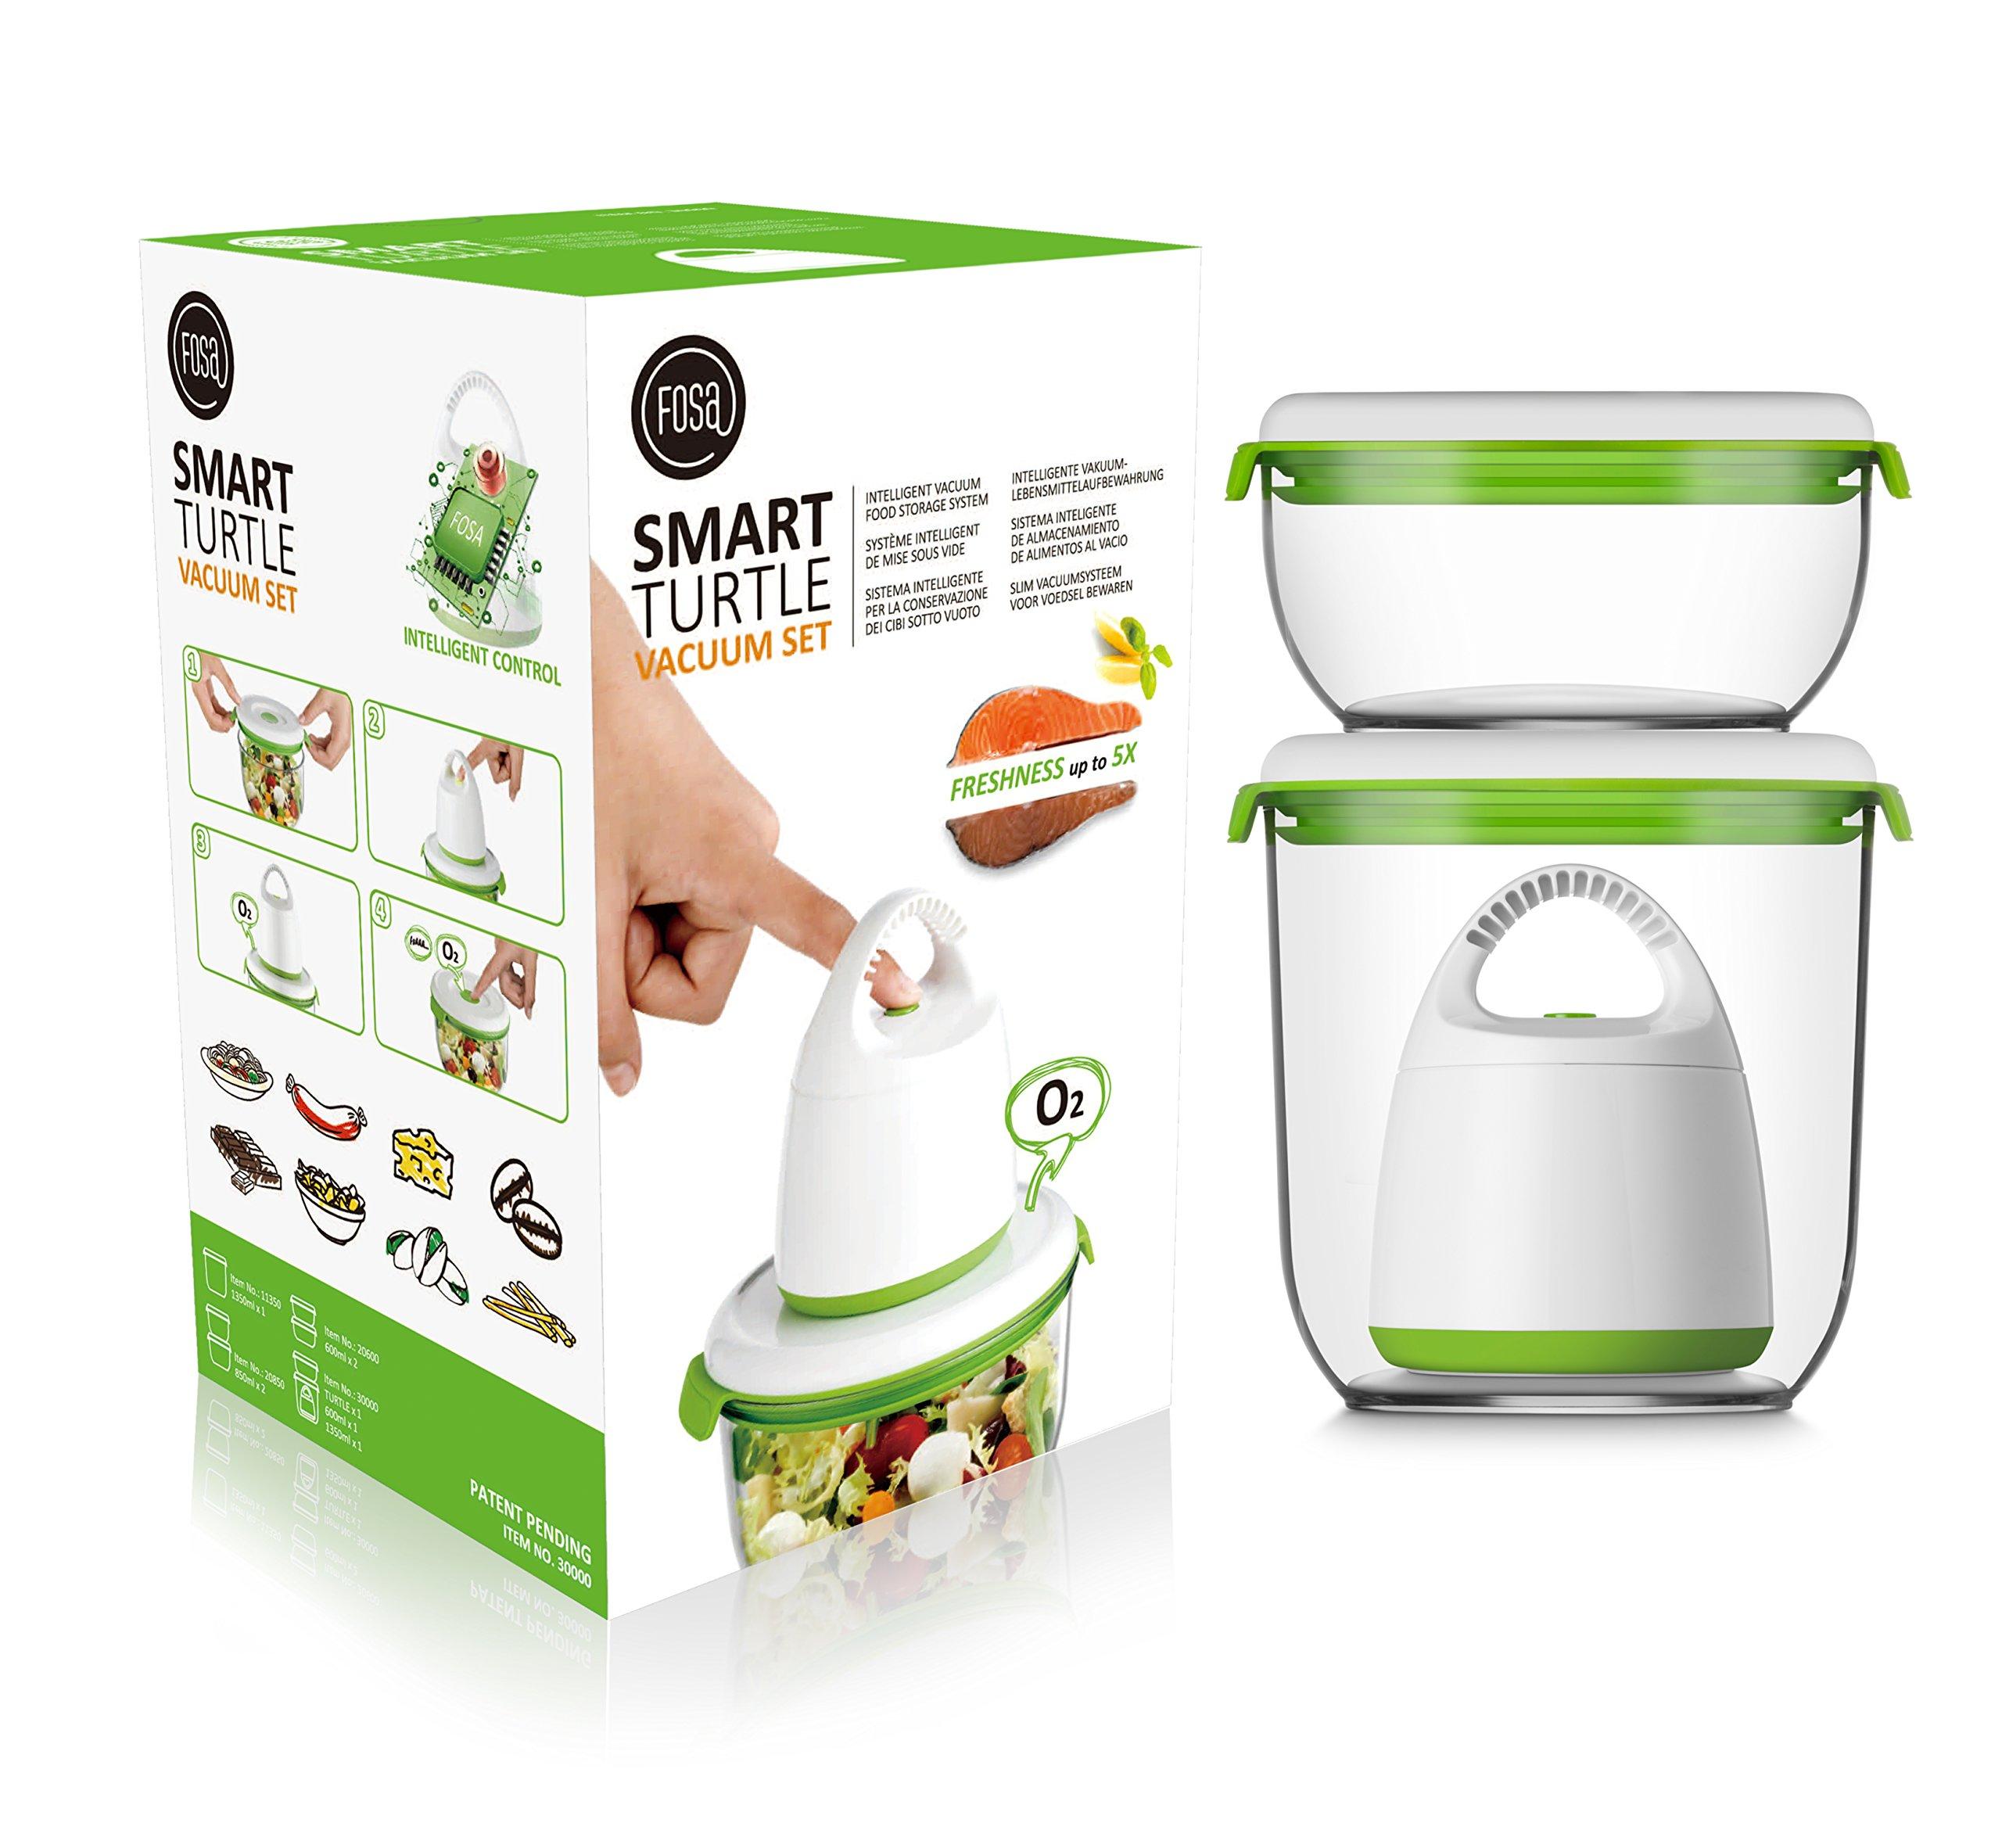 FOSA Vacuum Food Storage and Marinator Starter Set eBay